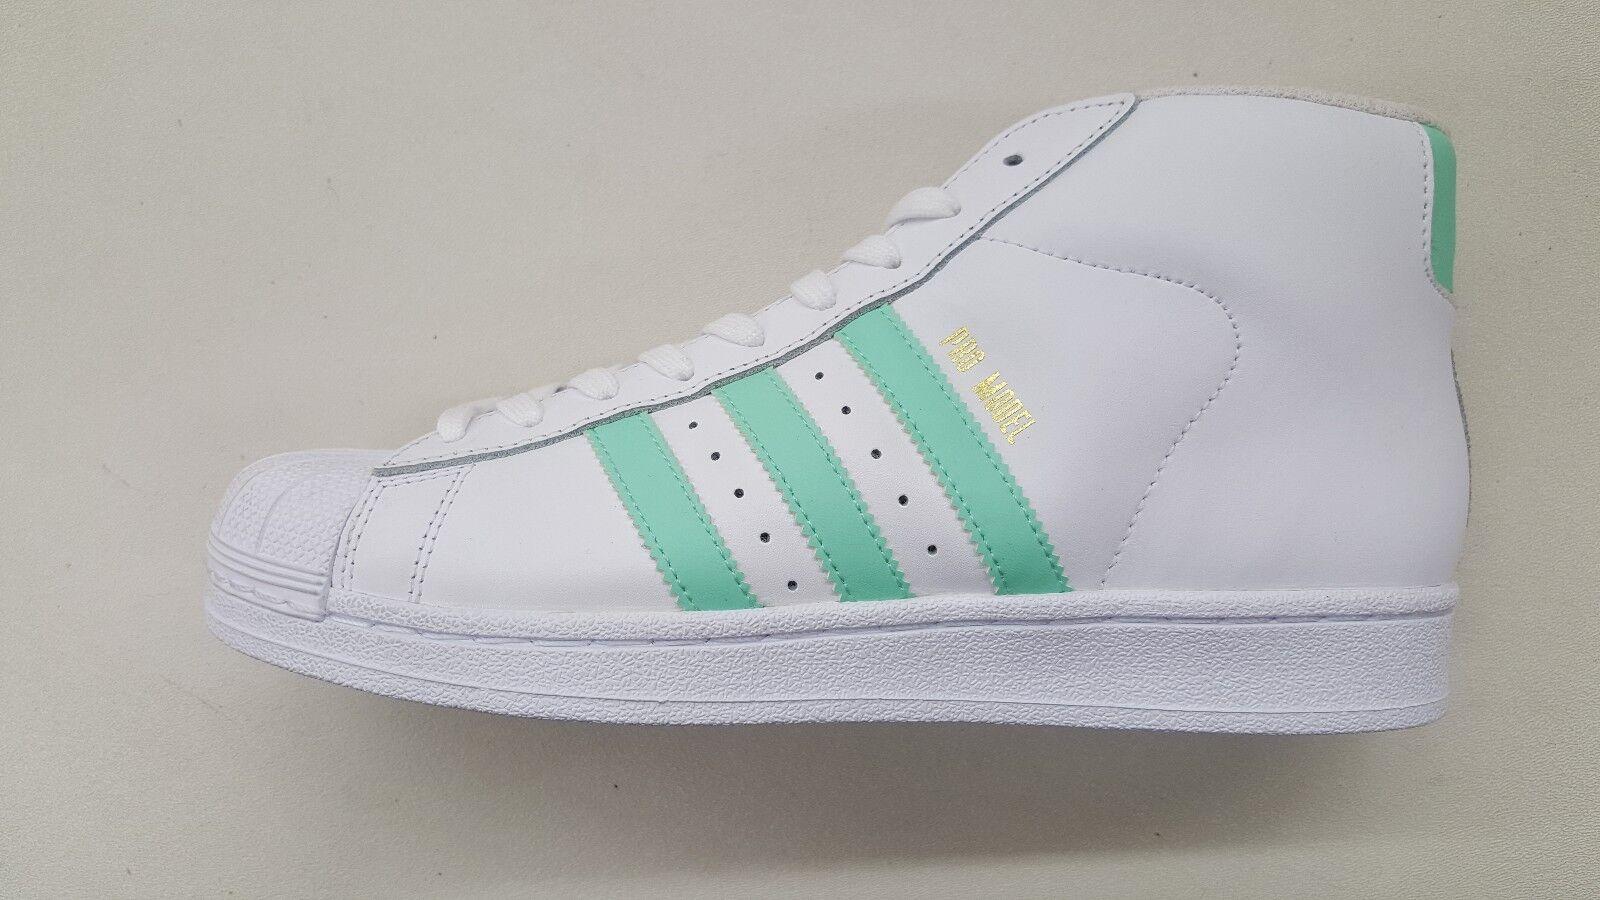 Adidas originals pro model weiße weiße model ostern grün gold mens größe turnschuhe by3728 d919fd